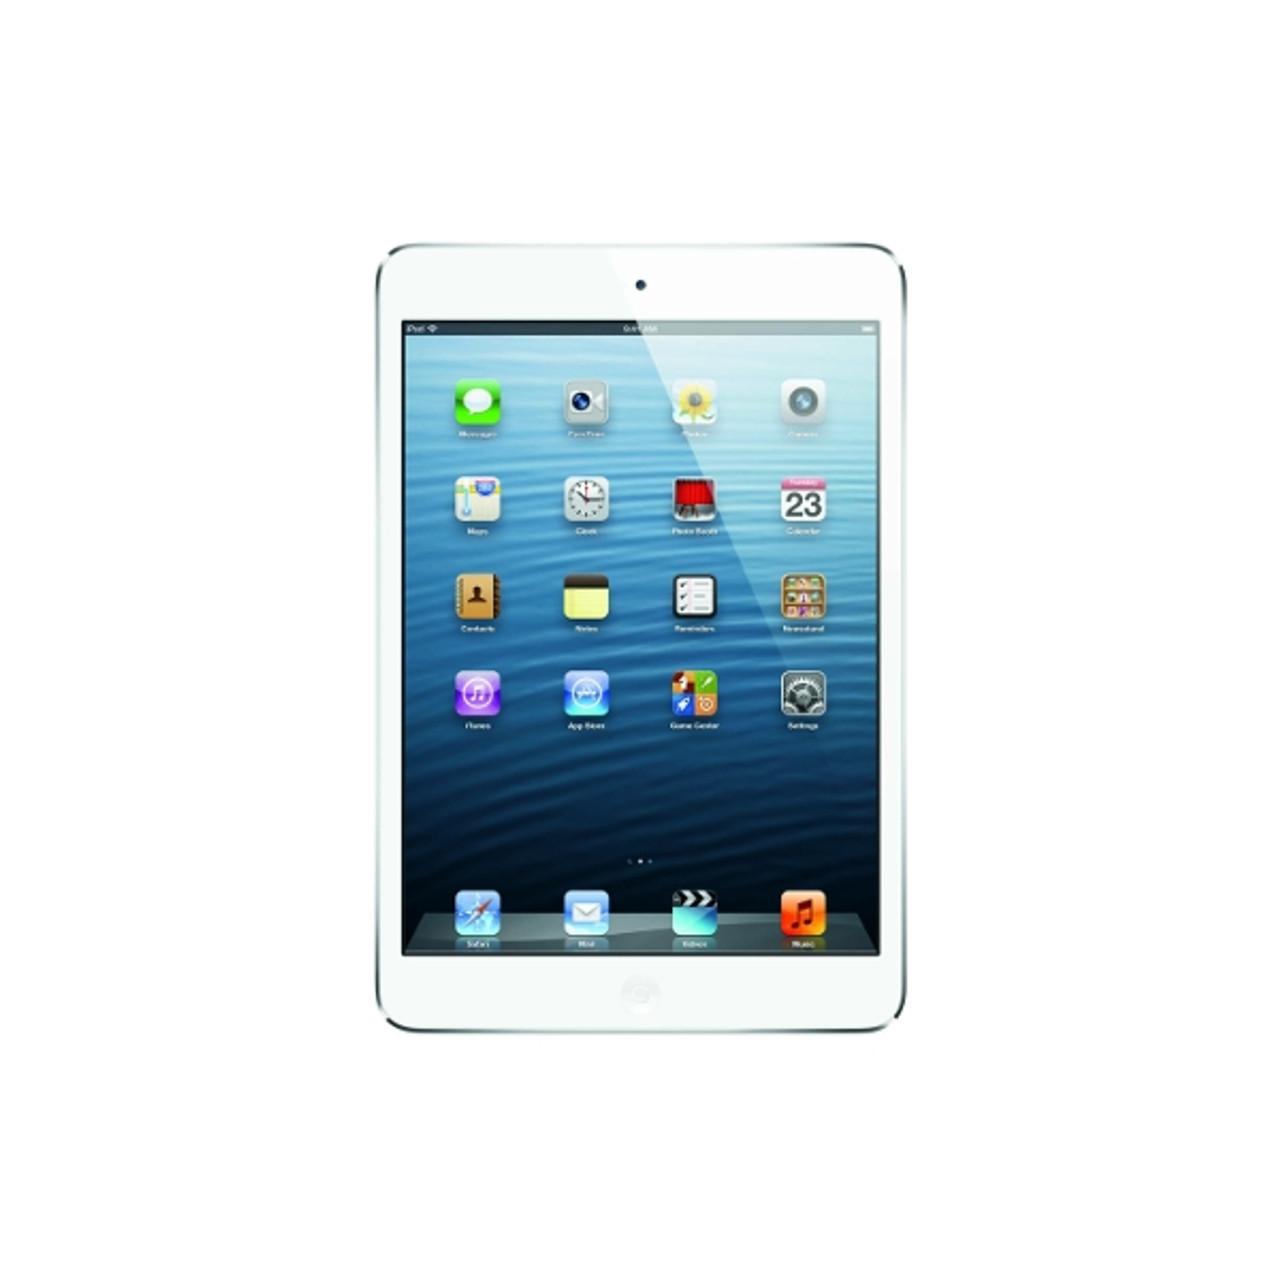 Apple iPad mini 64GB - White & Silver MD533LL/A - Good Condition